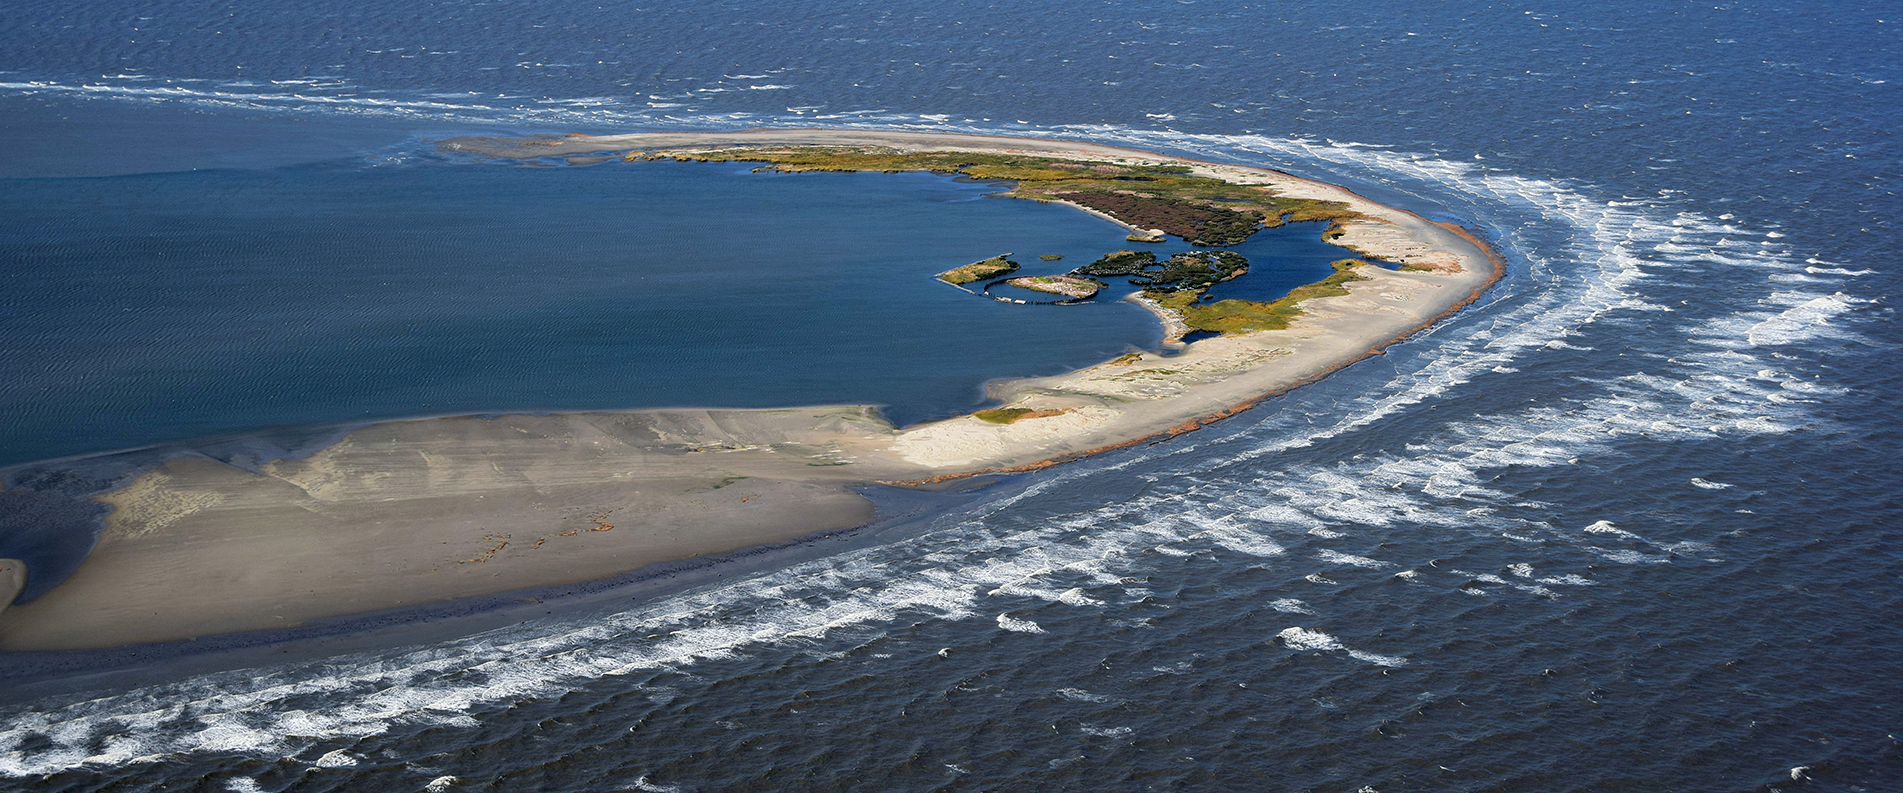 Restoration Begins on North Breton Island